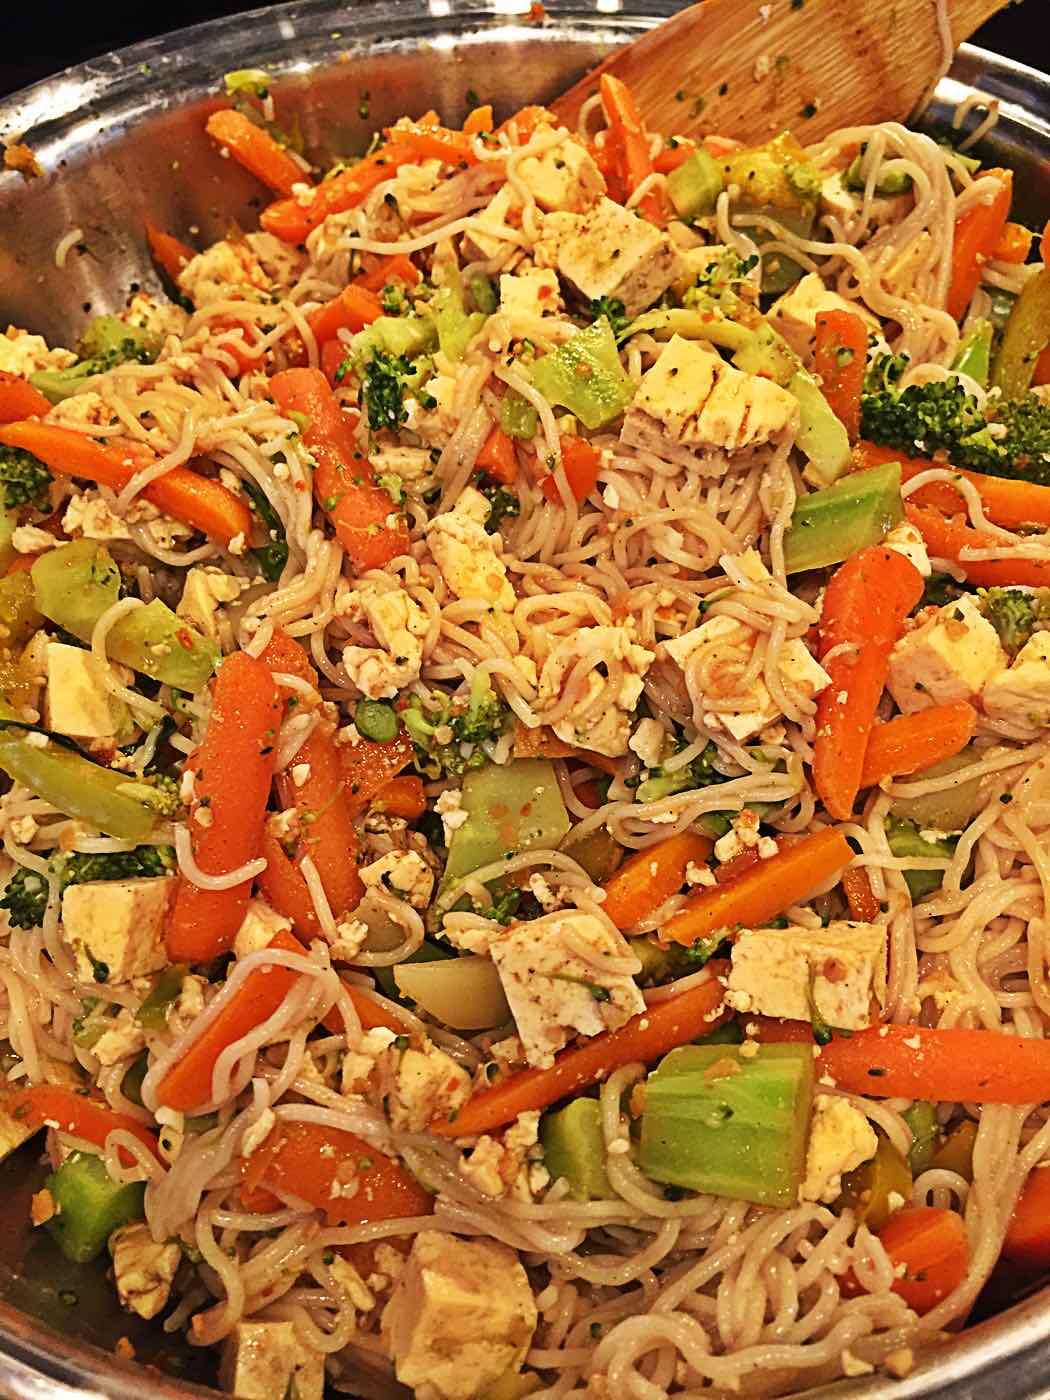 Vegan Pad Thai - Stir in the Noodles in the wok